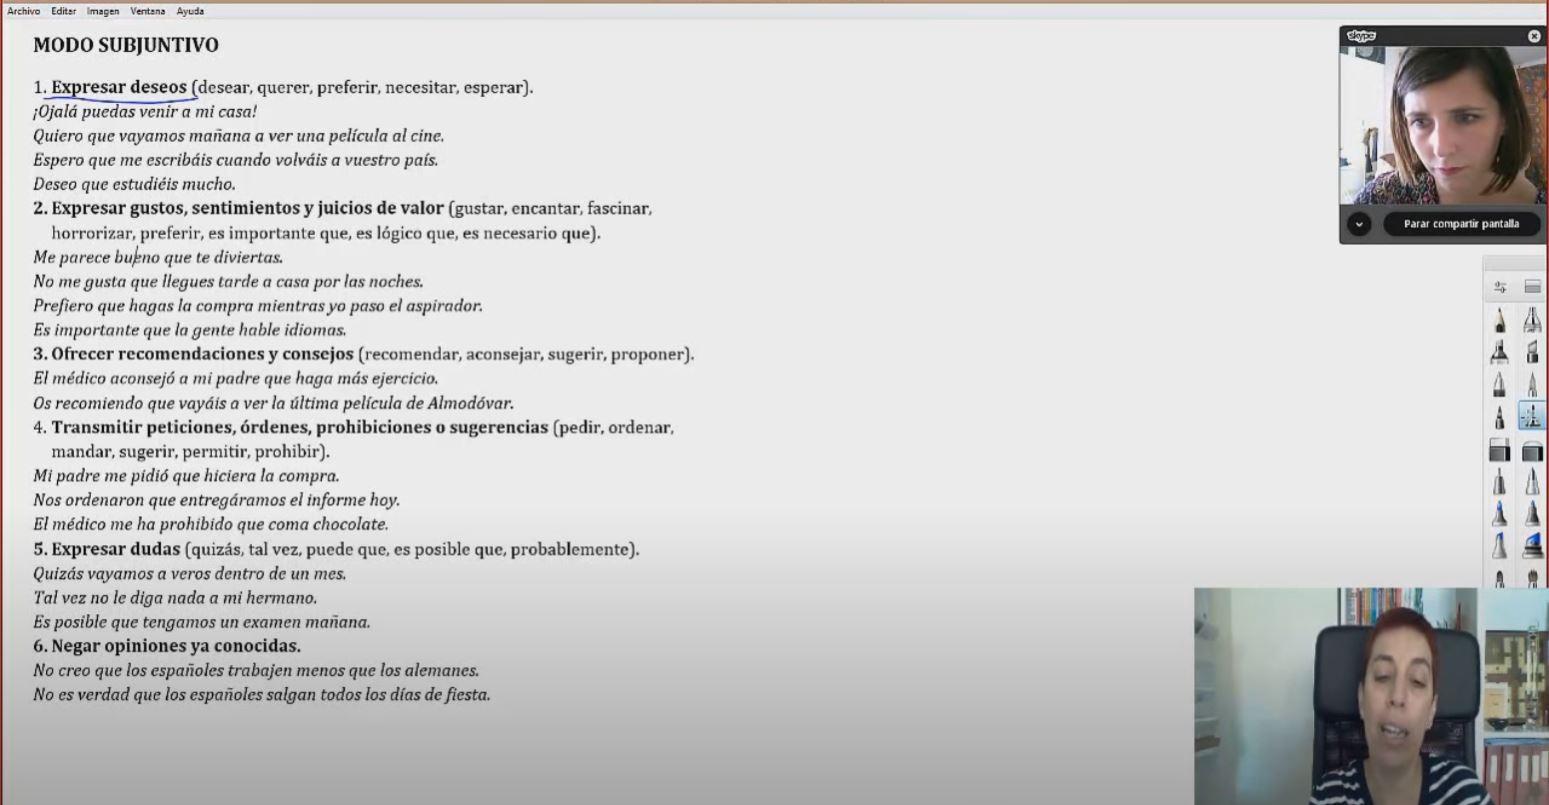 Ejemplo de clase por Skype de español como lengua extranjera